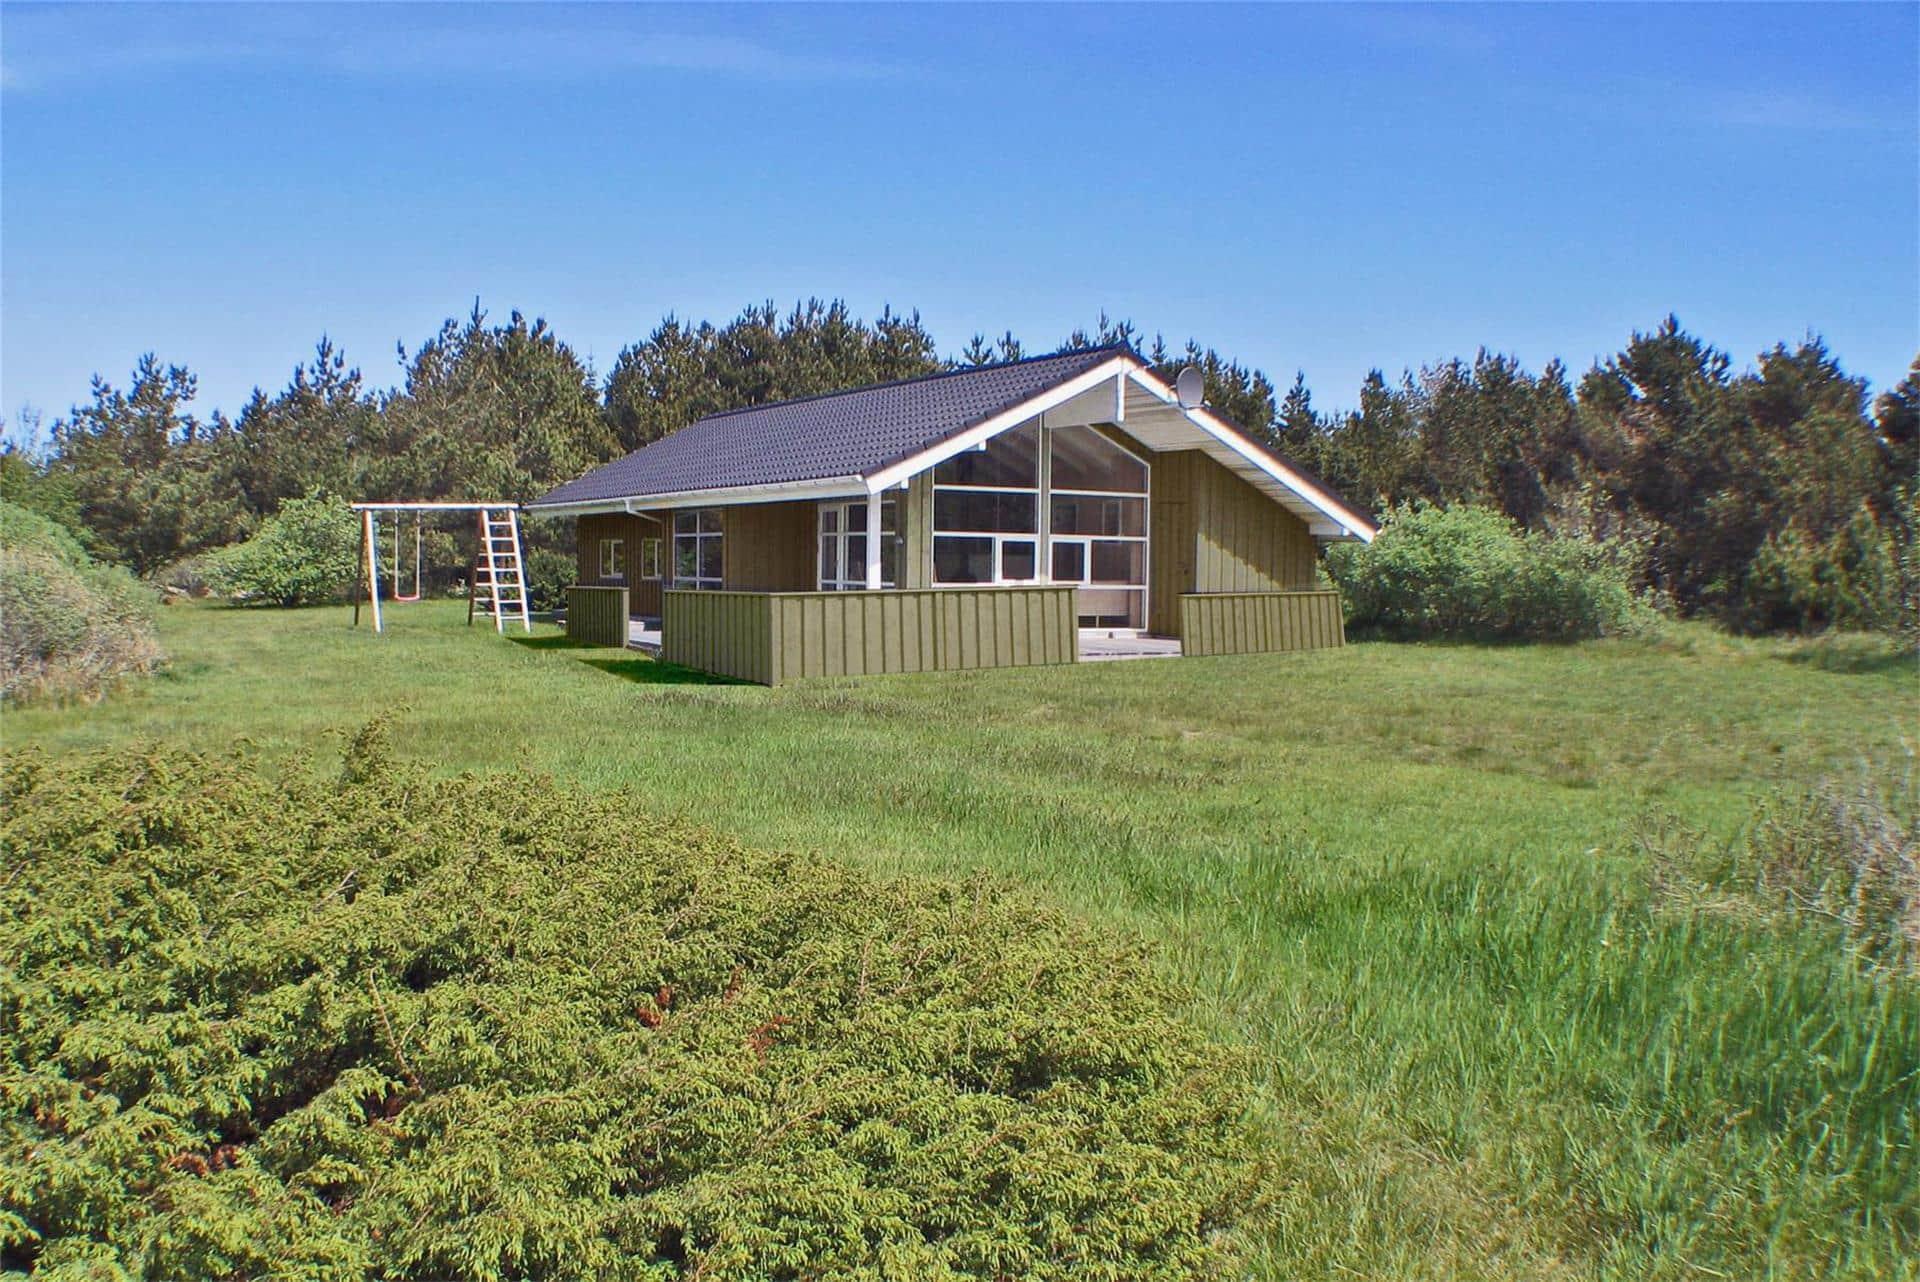 Image 1-14 Holiday-home 481, Rødhusparken 10, DK - 9490 Pandrup